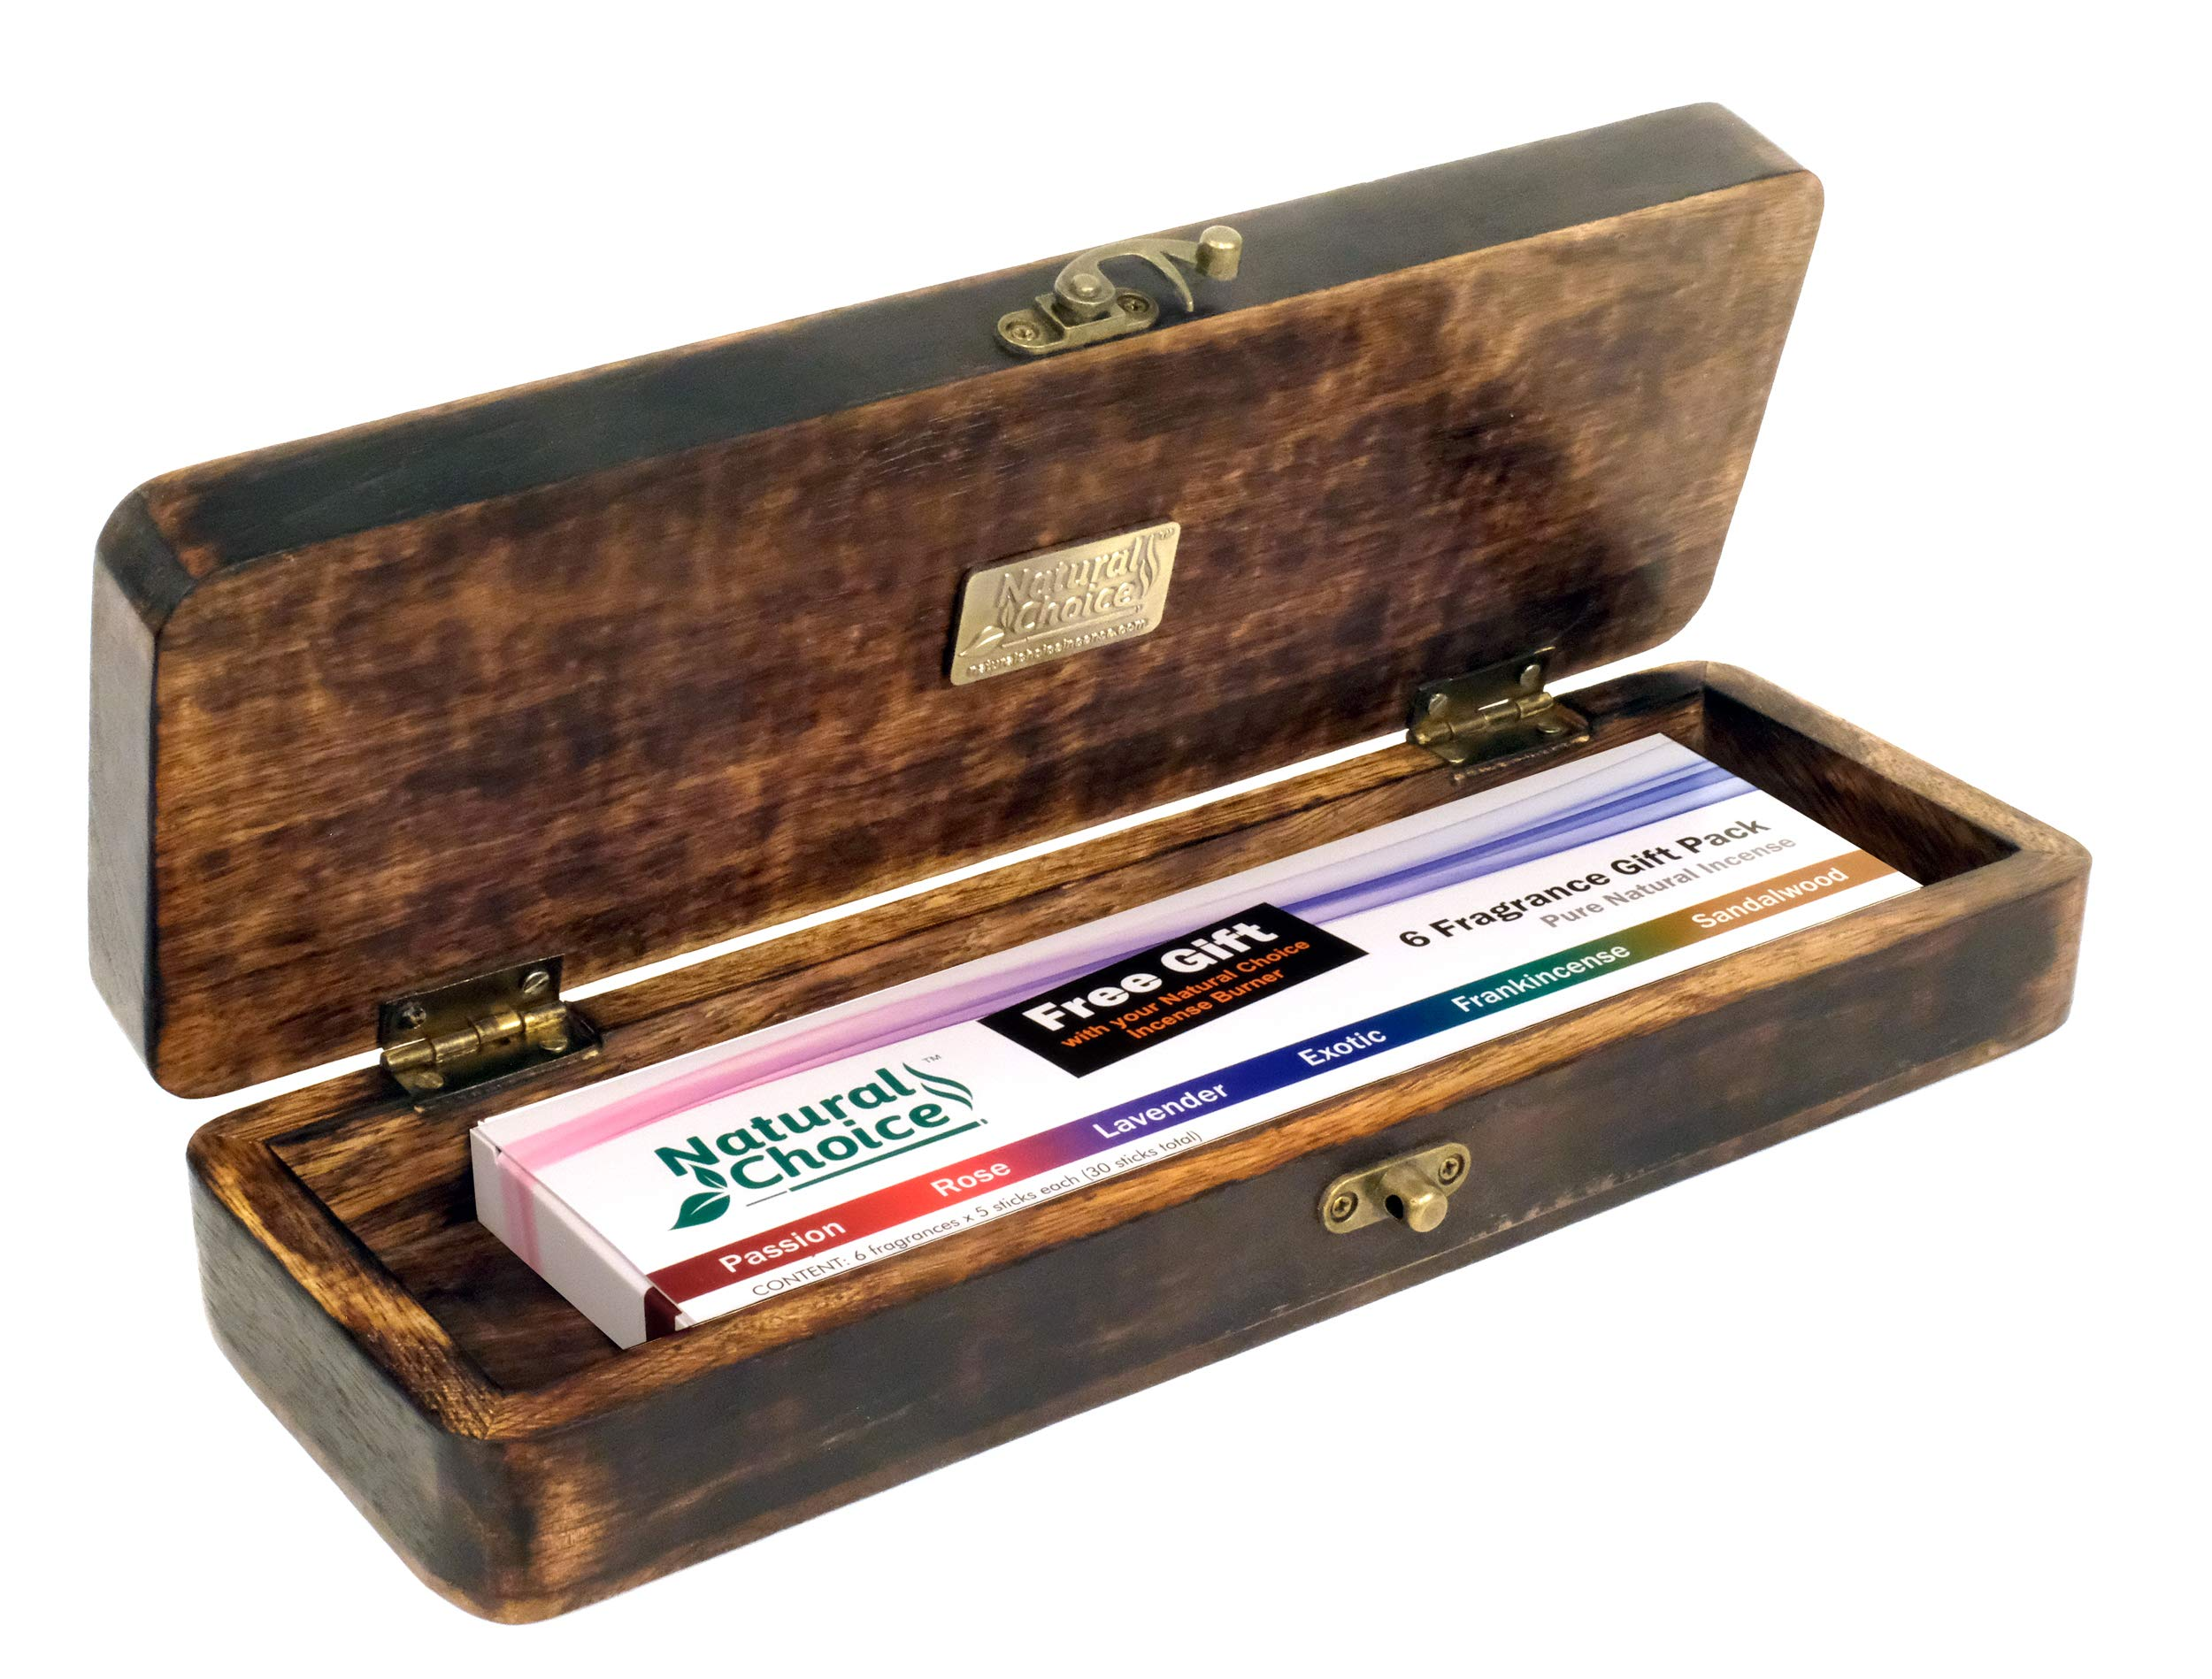 Natural Choice Incense Treasure Chest Incense Storage Box & Ash Catcher (Natural) by Natural Choice Incense (Image #9)